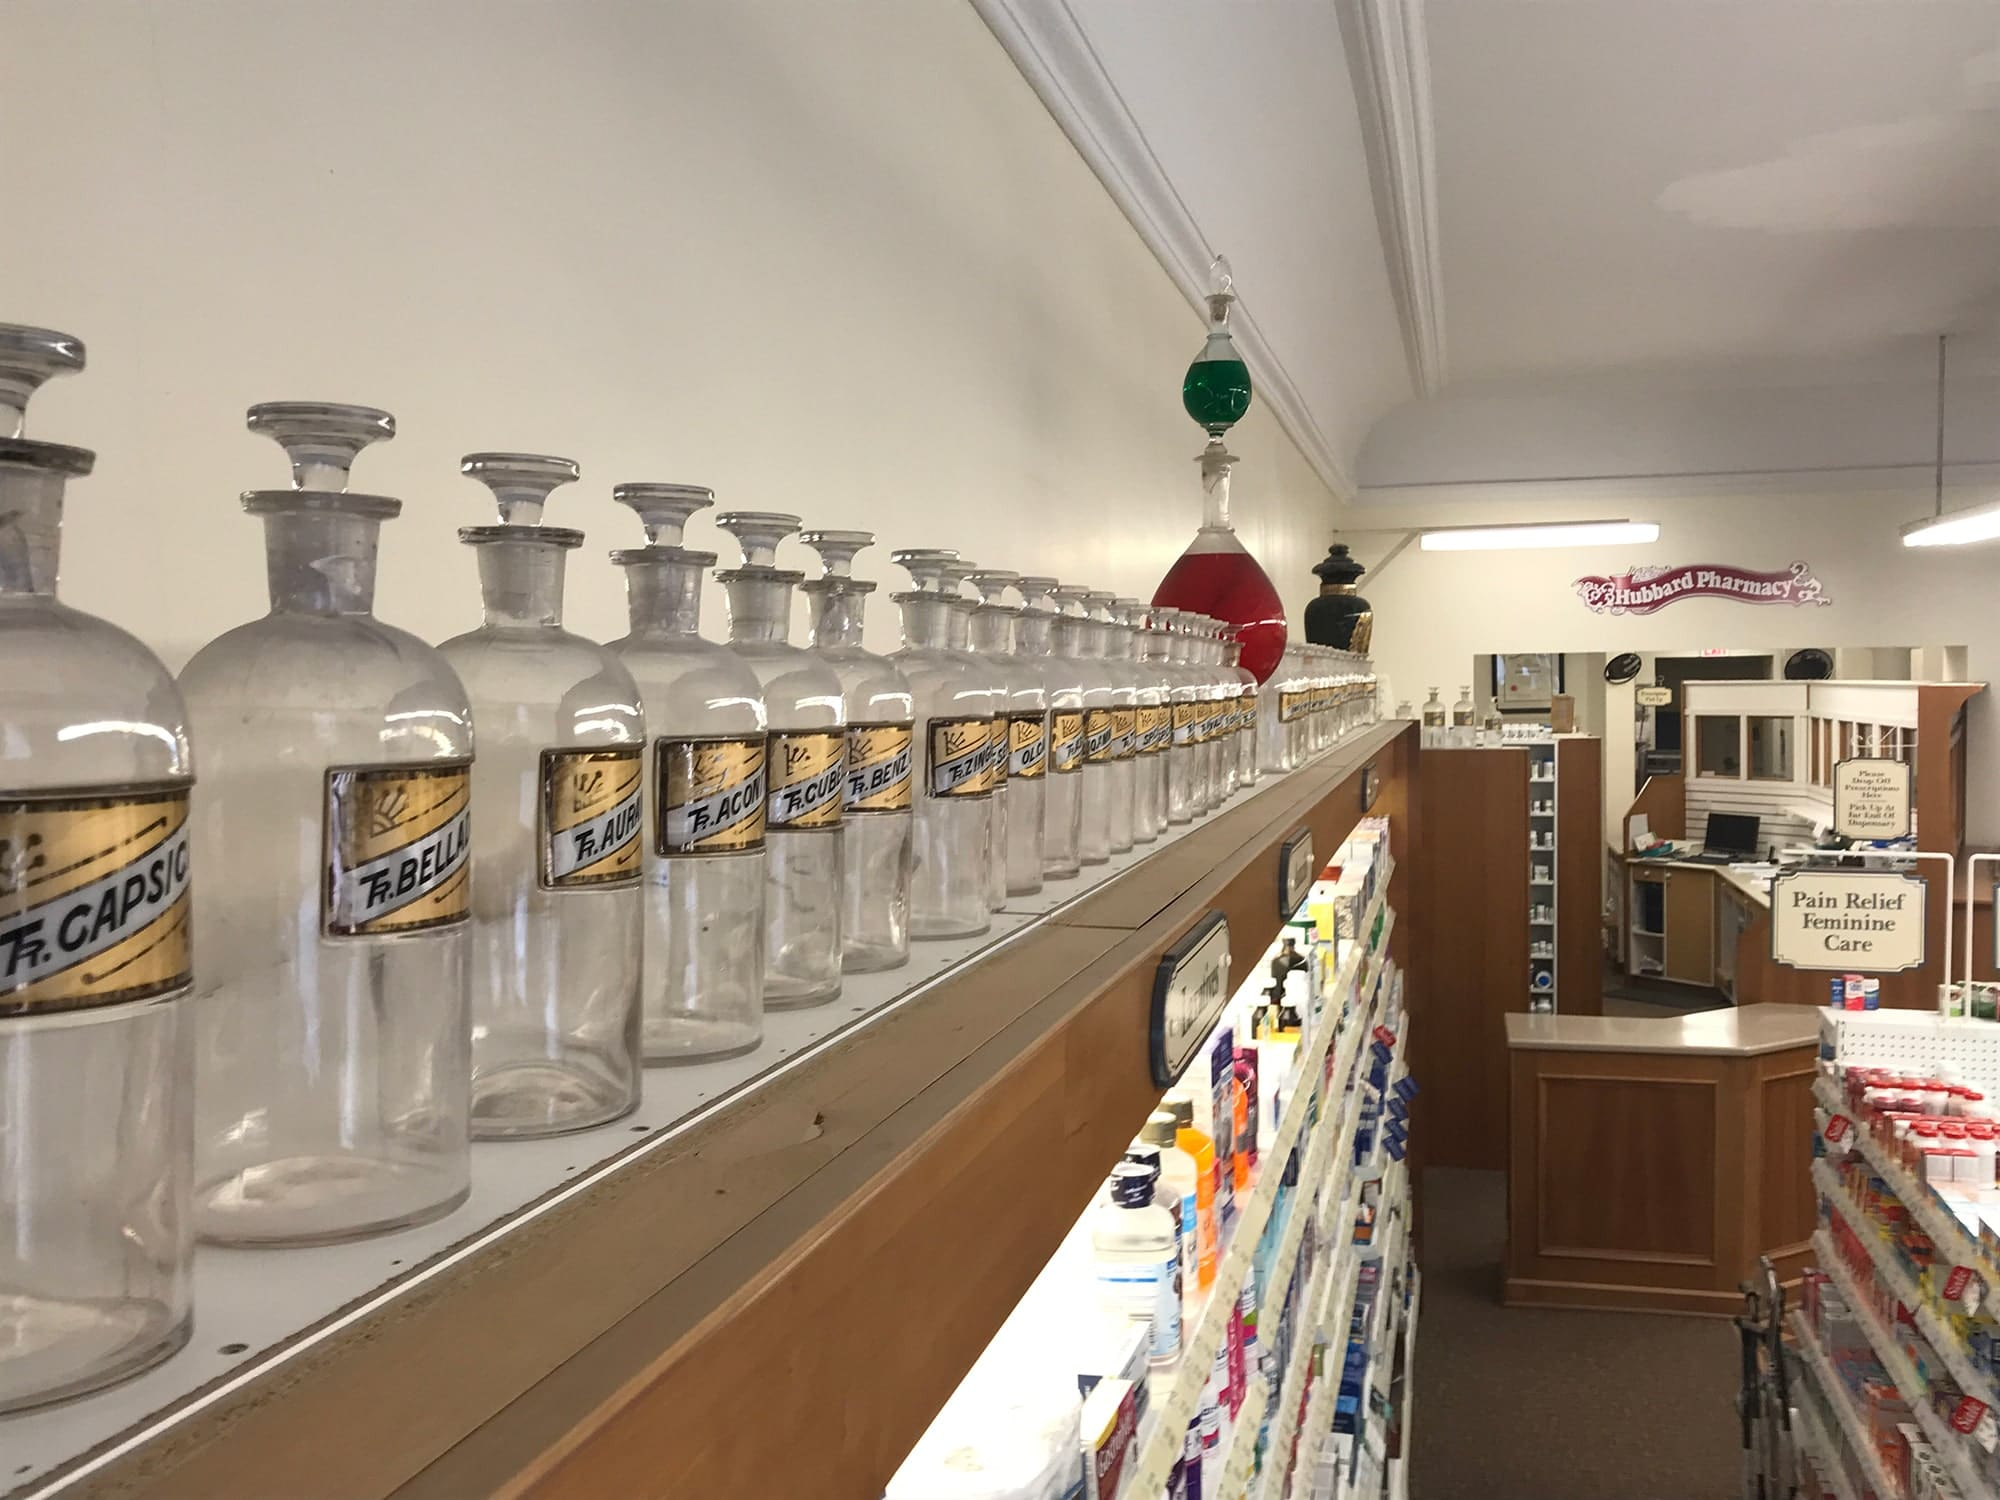 Hubbard pharmacy in Toronto